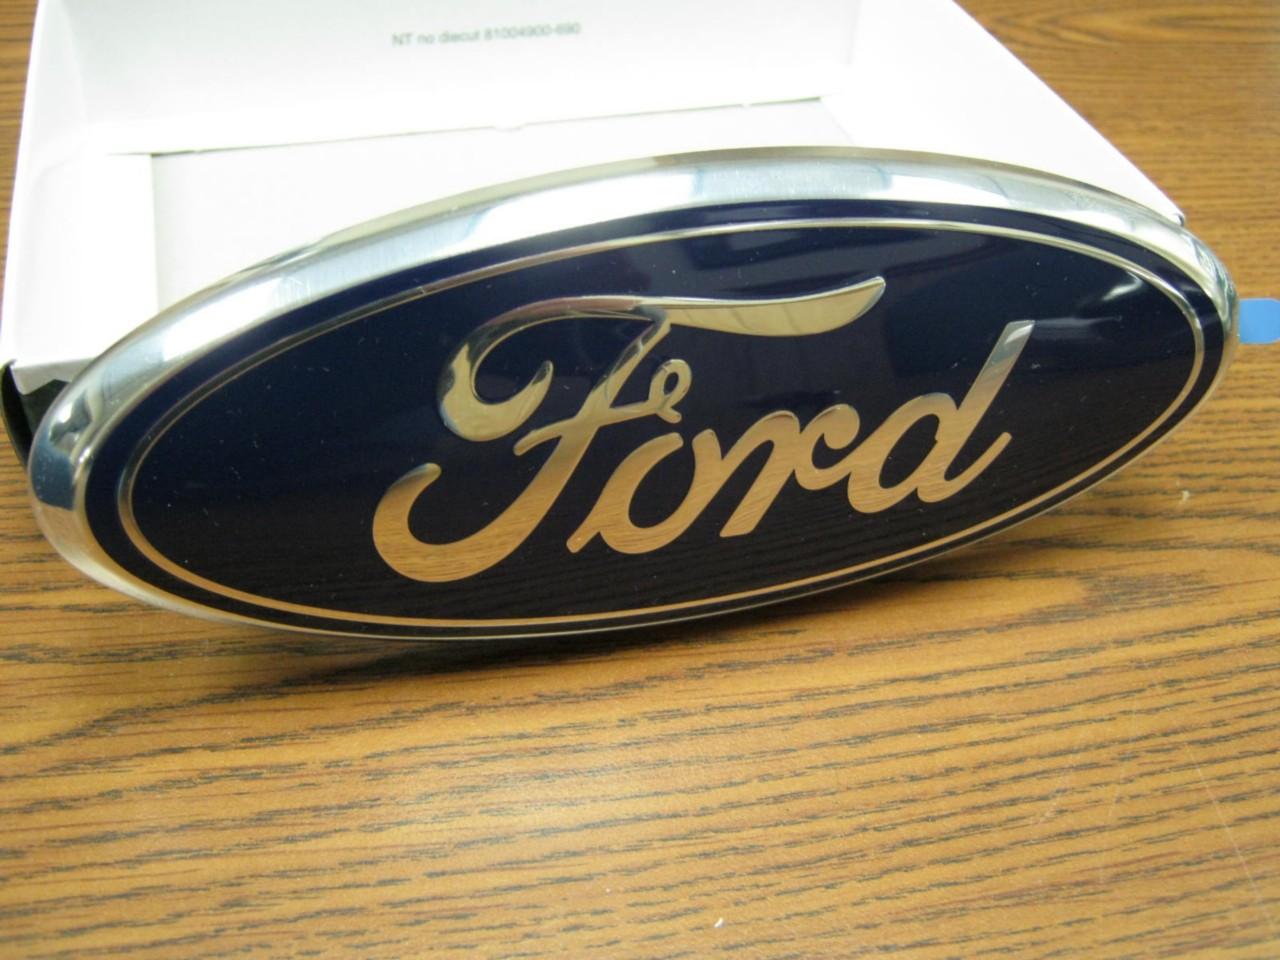 NEW 06,07,08,09,10,11,12 Ford Fusion Grill OEM Emblem!